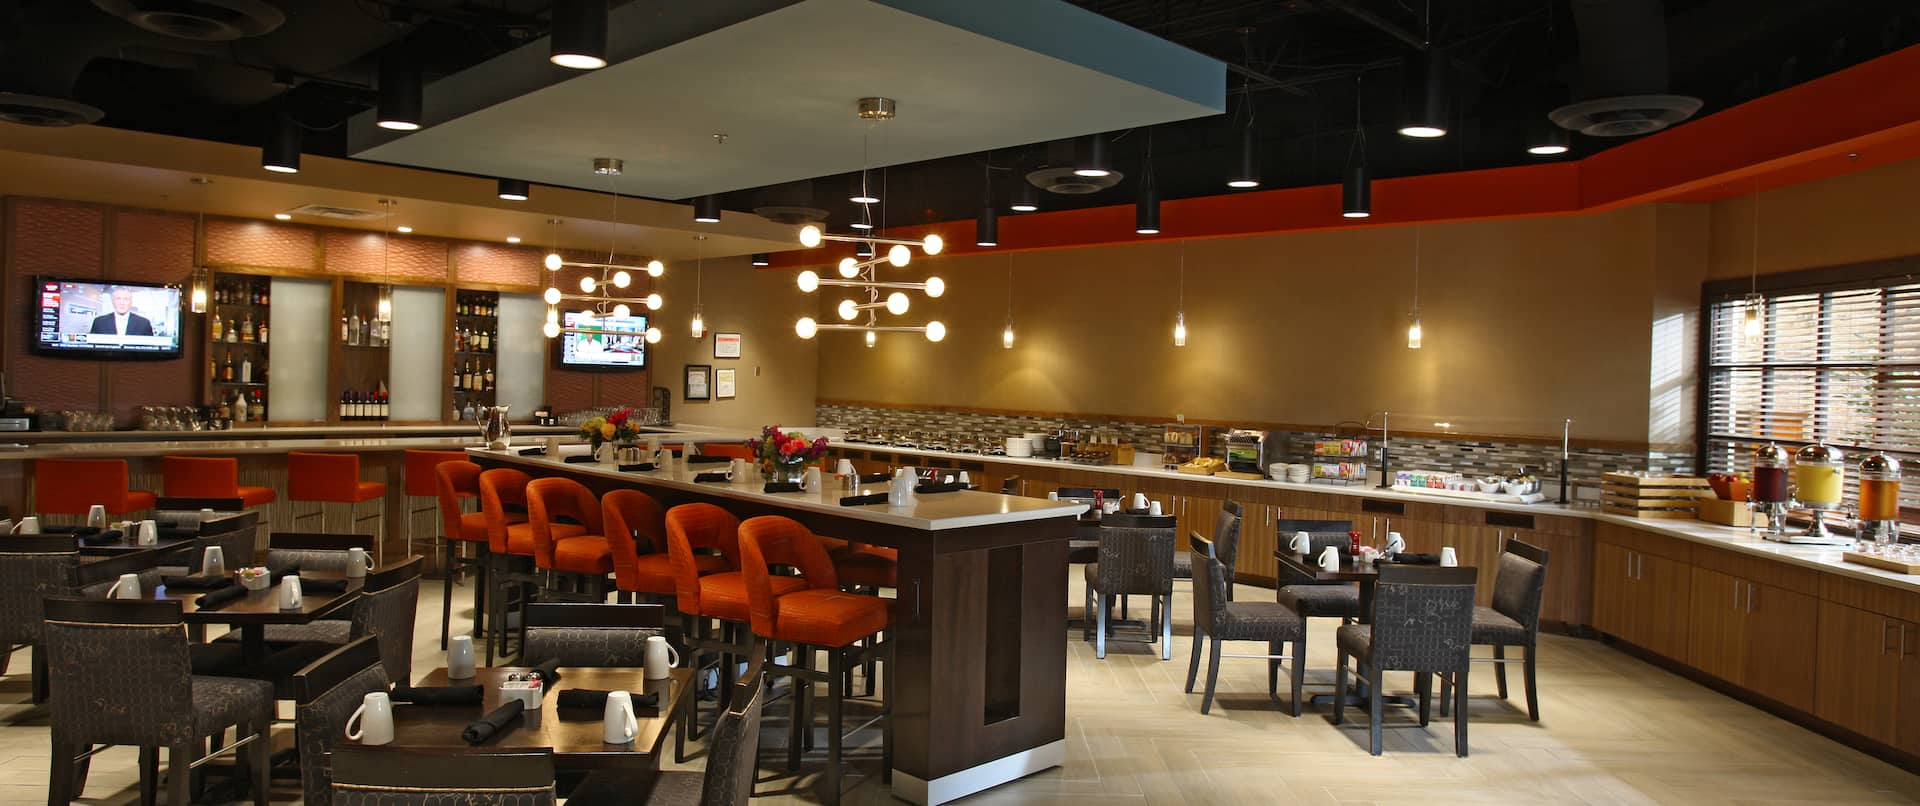 Doubletree Burger Bar